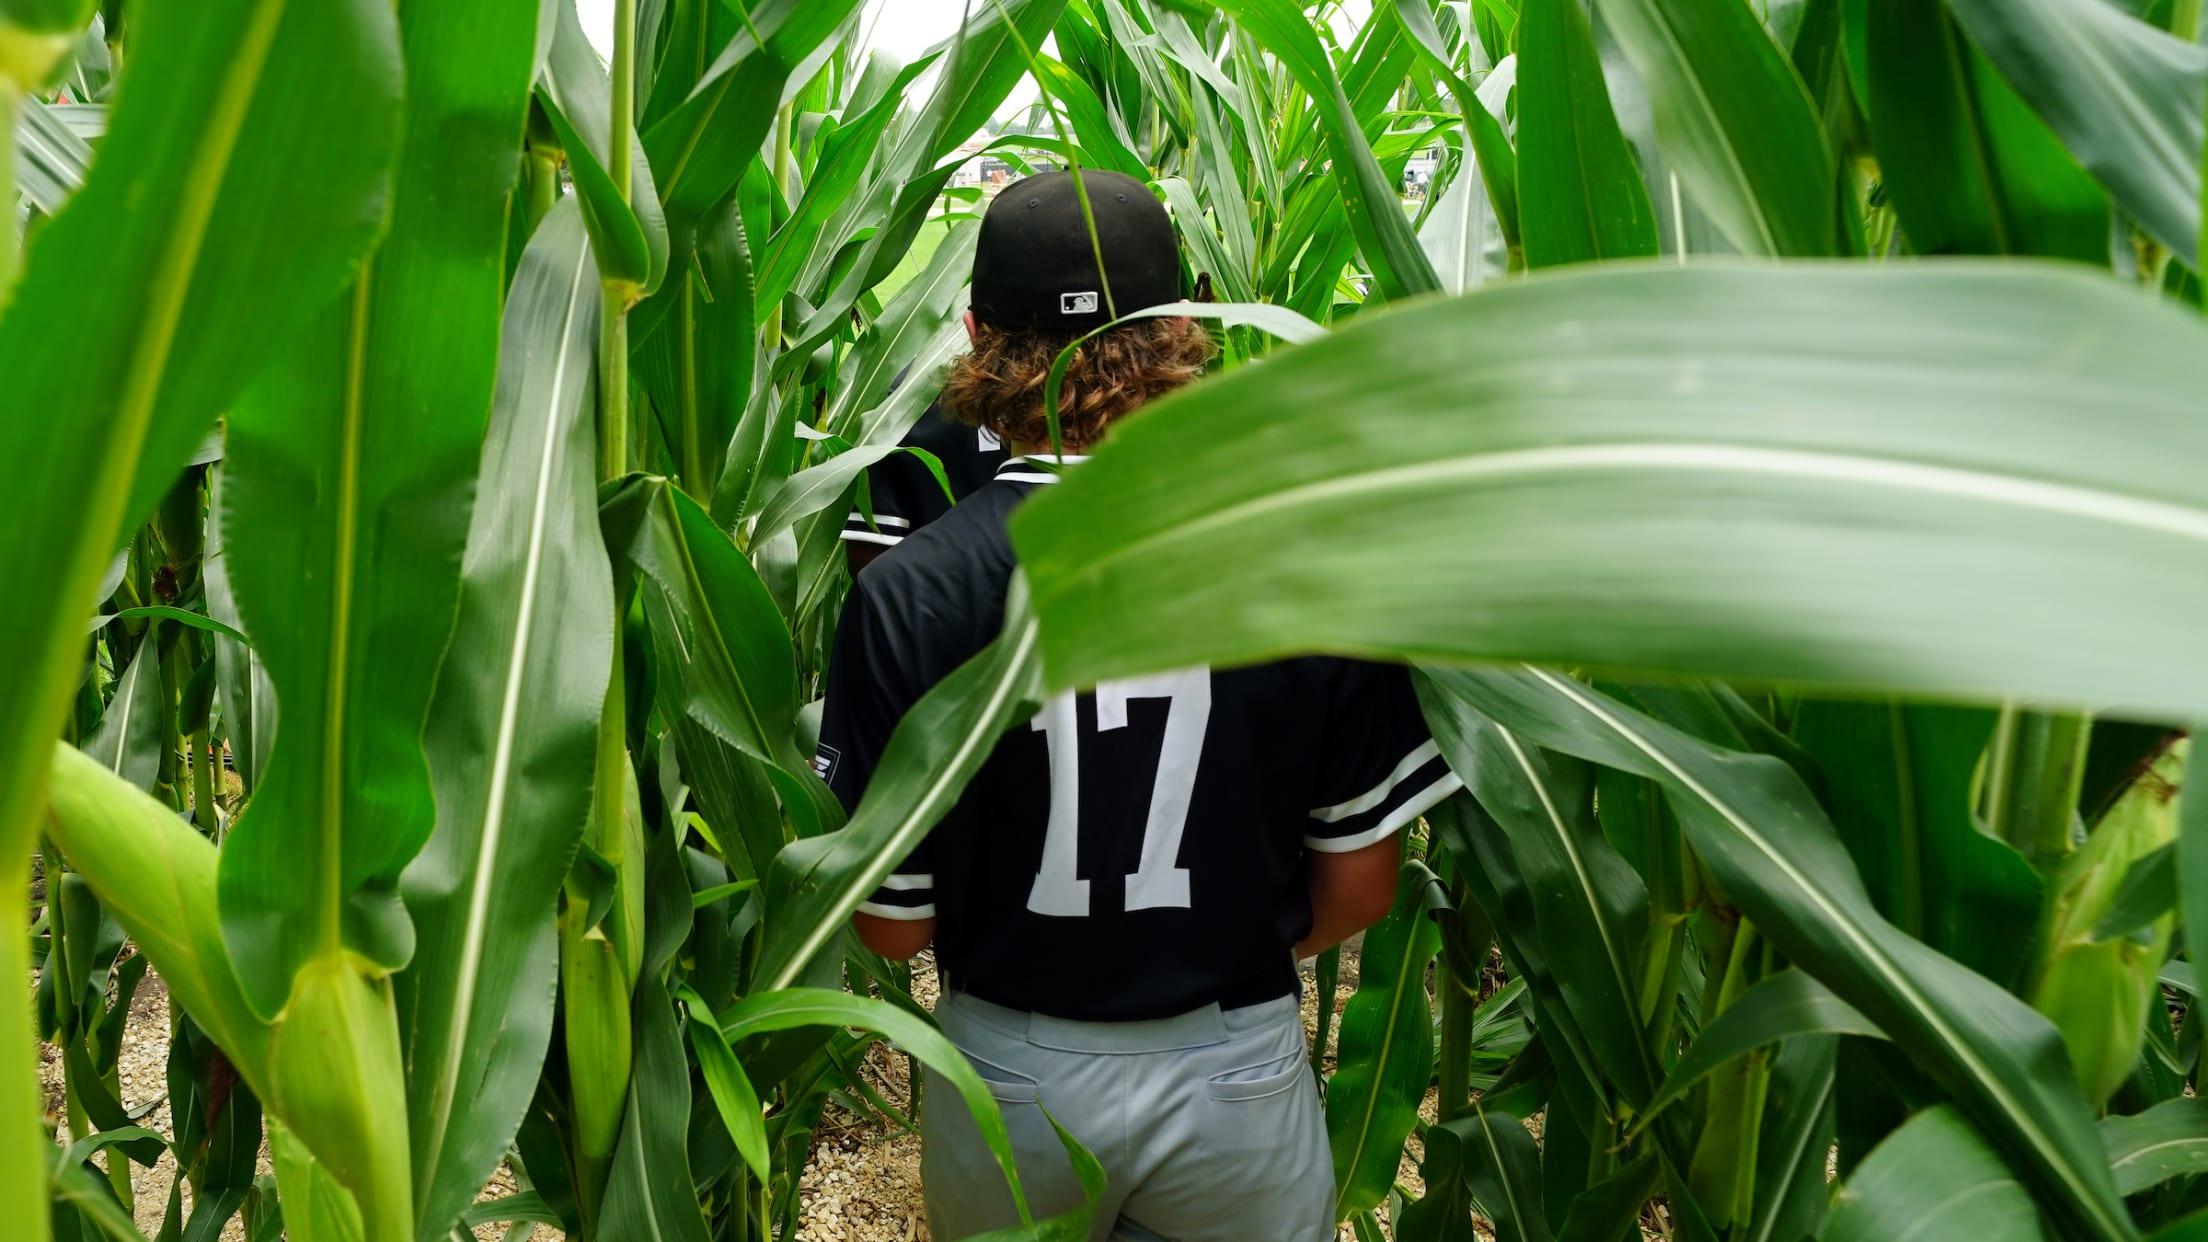 2568x1444 Field of Dreams cornfield player 20210811